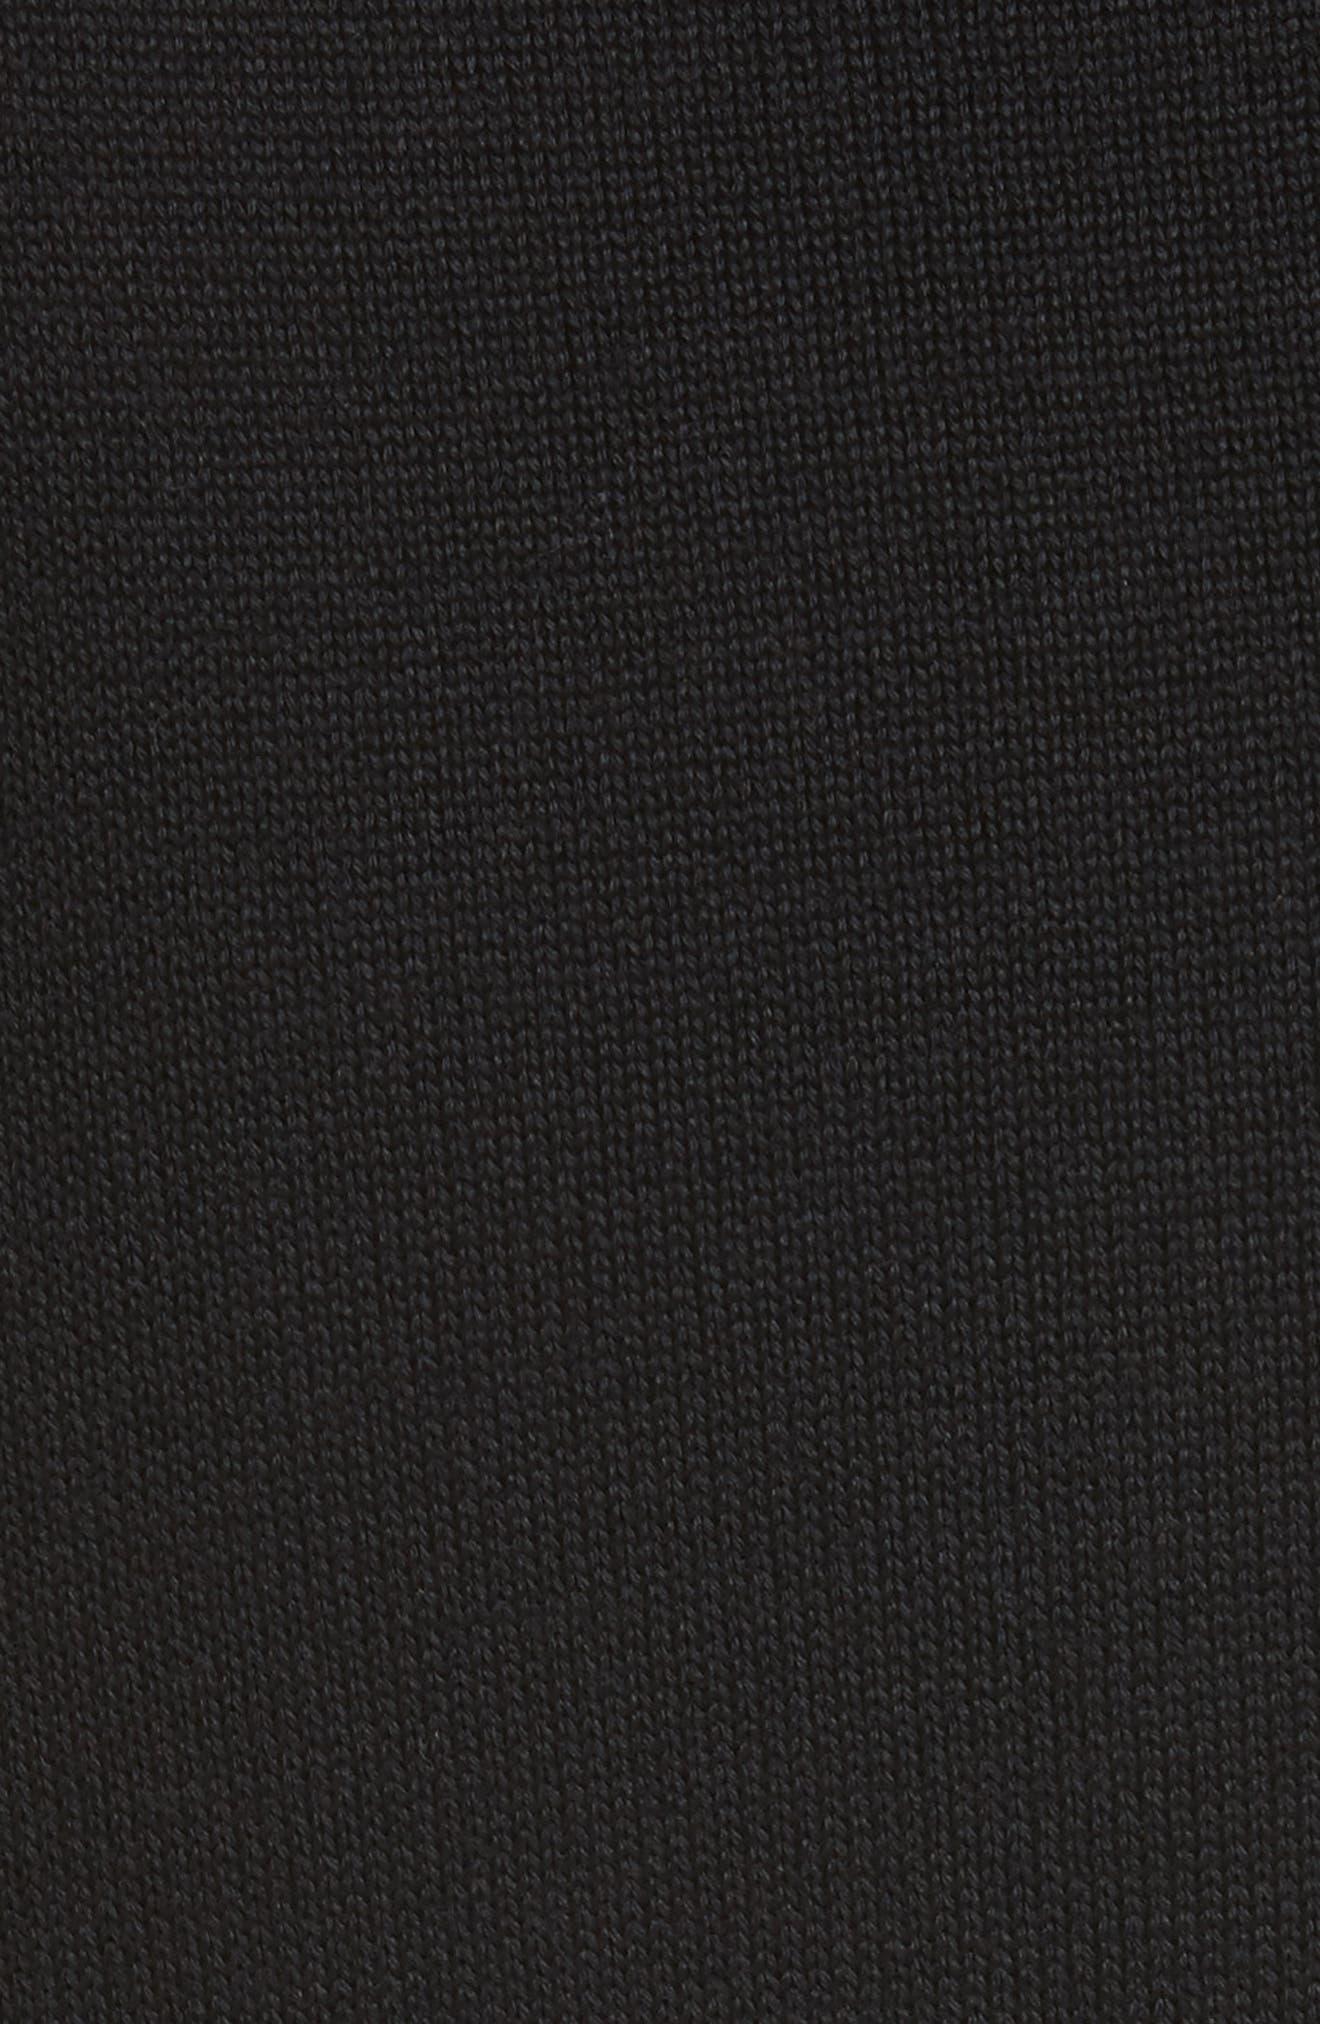 Knit Sleeveless Top,                             Alternate thumbnail 5, color,                             003